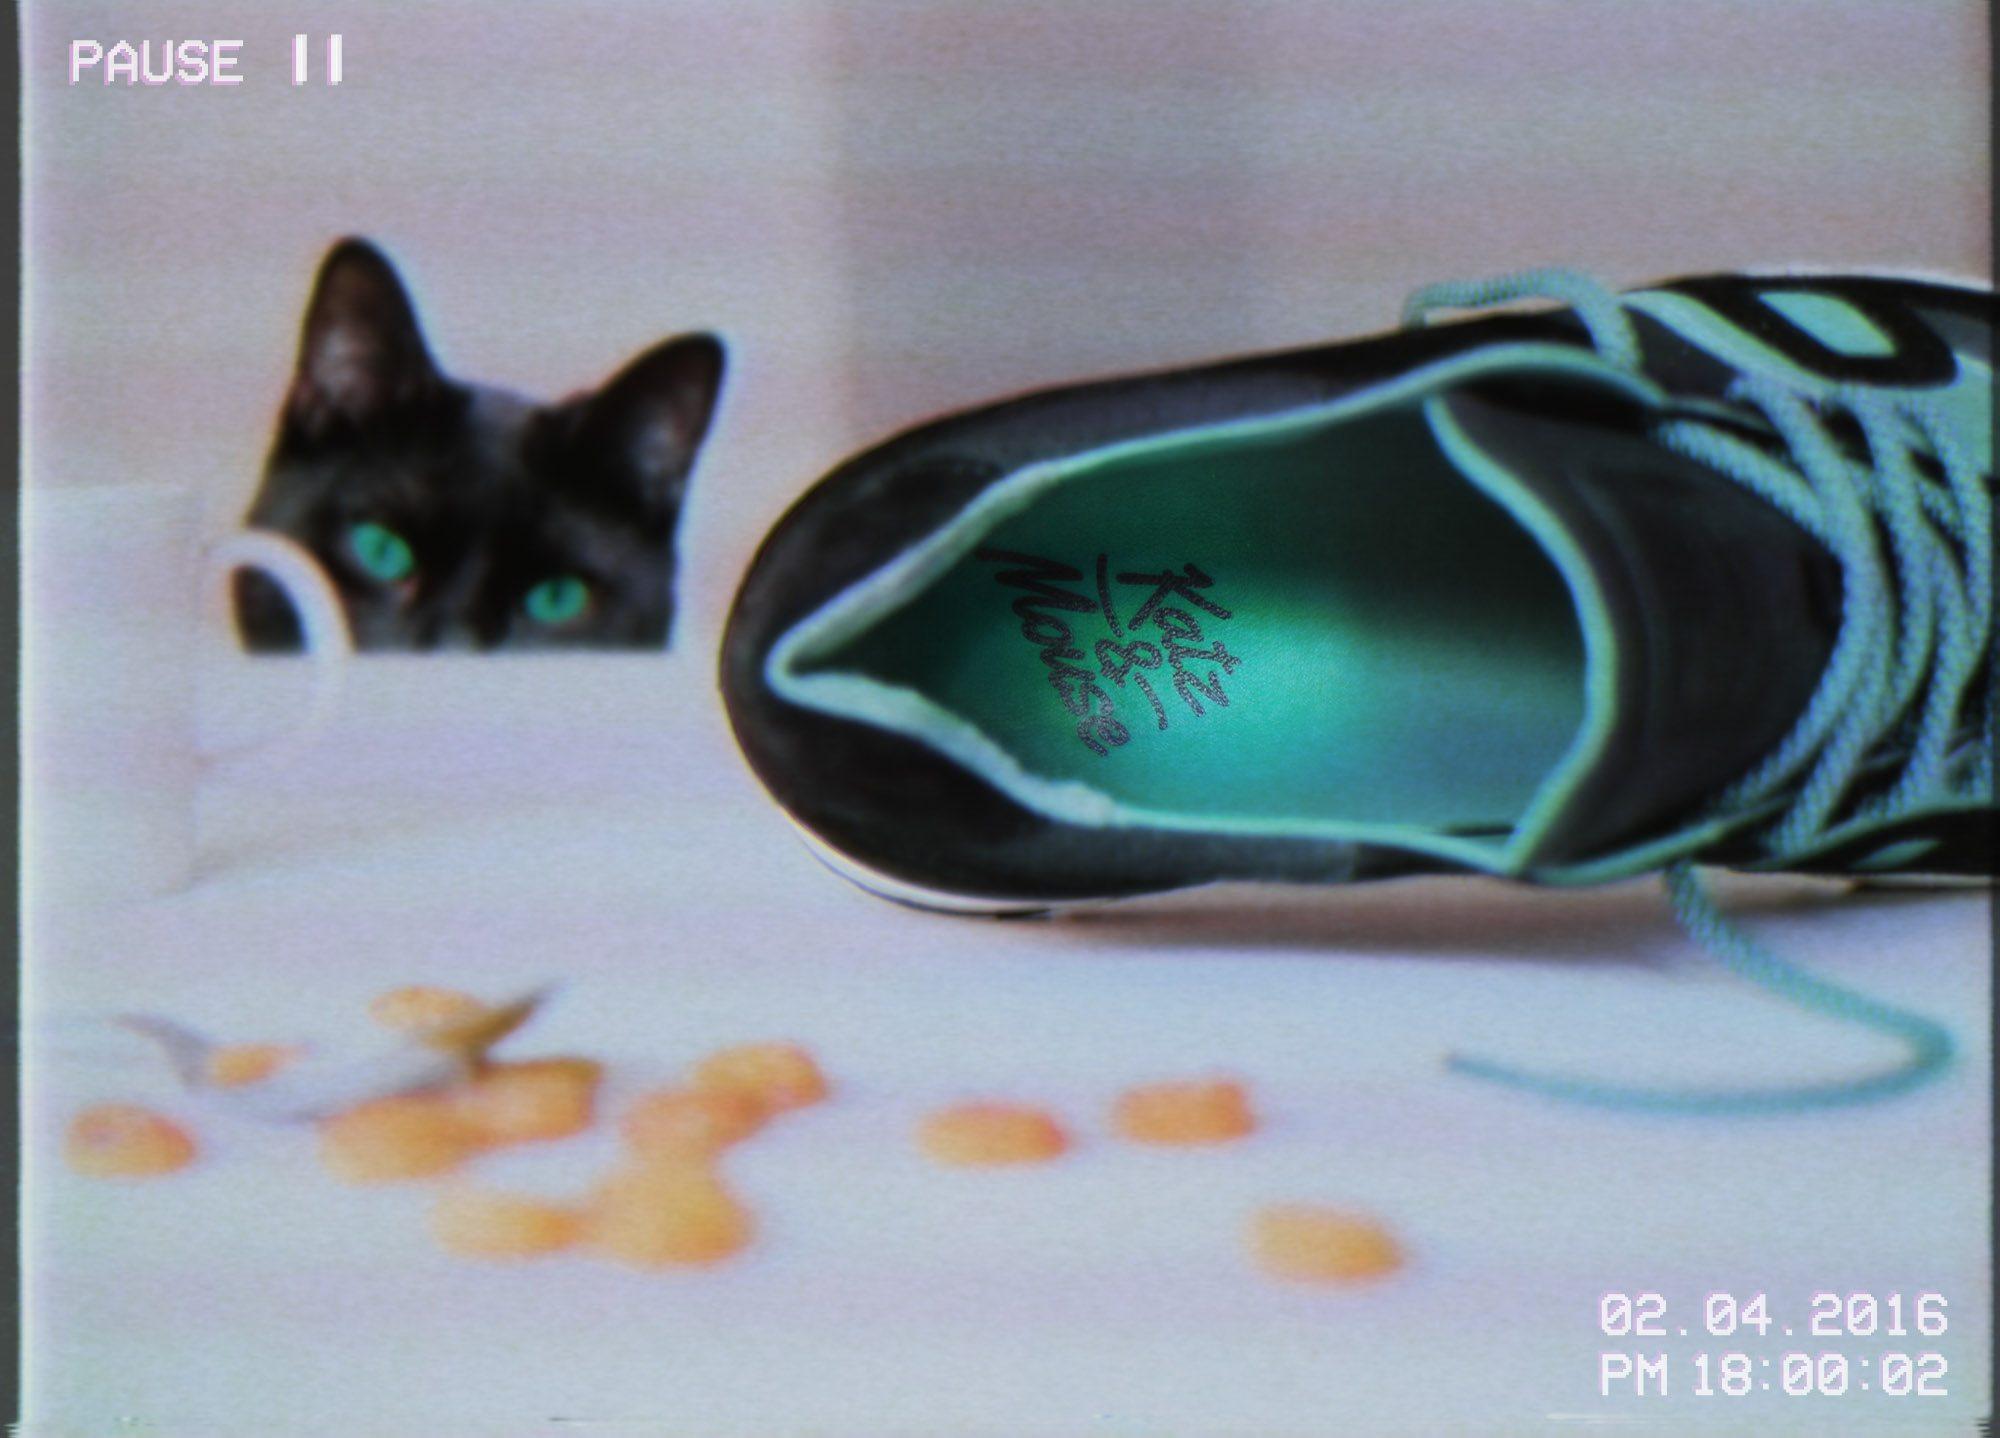 asphaltgold x Kangaroos Omnirun Katz Mouse 7